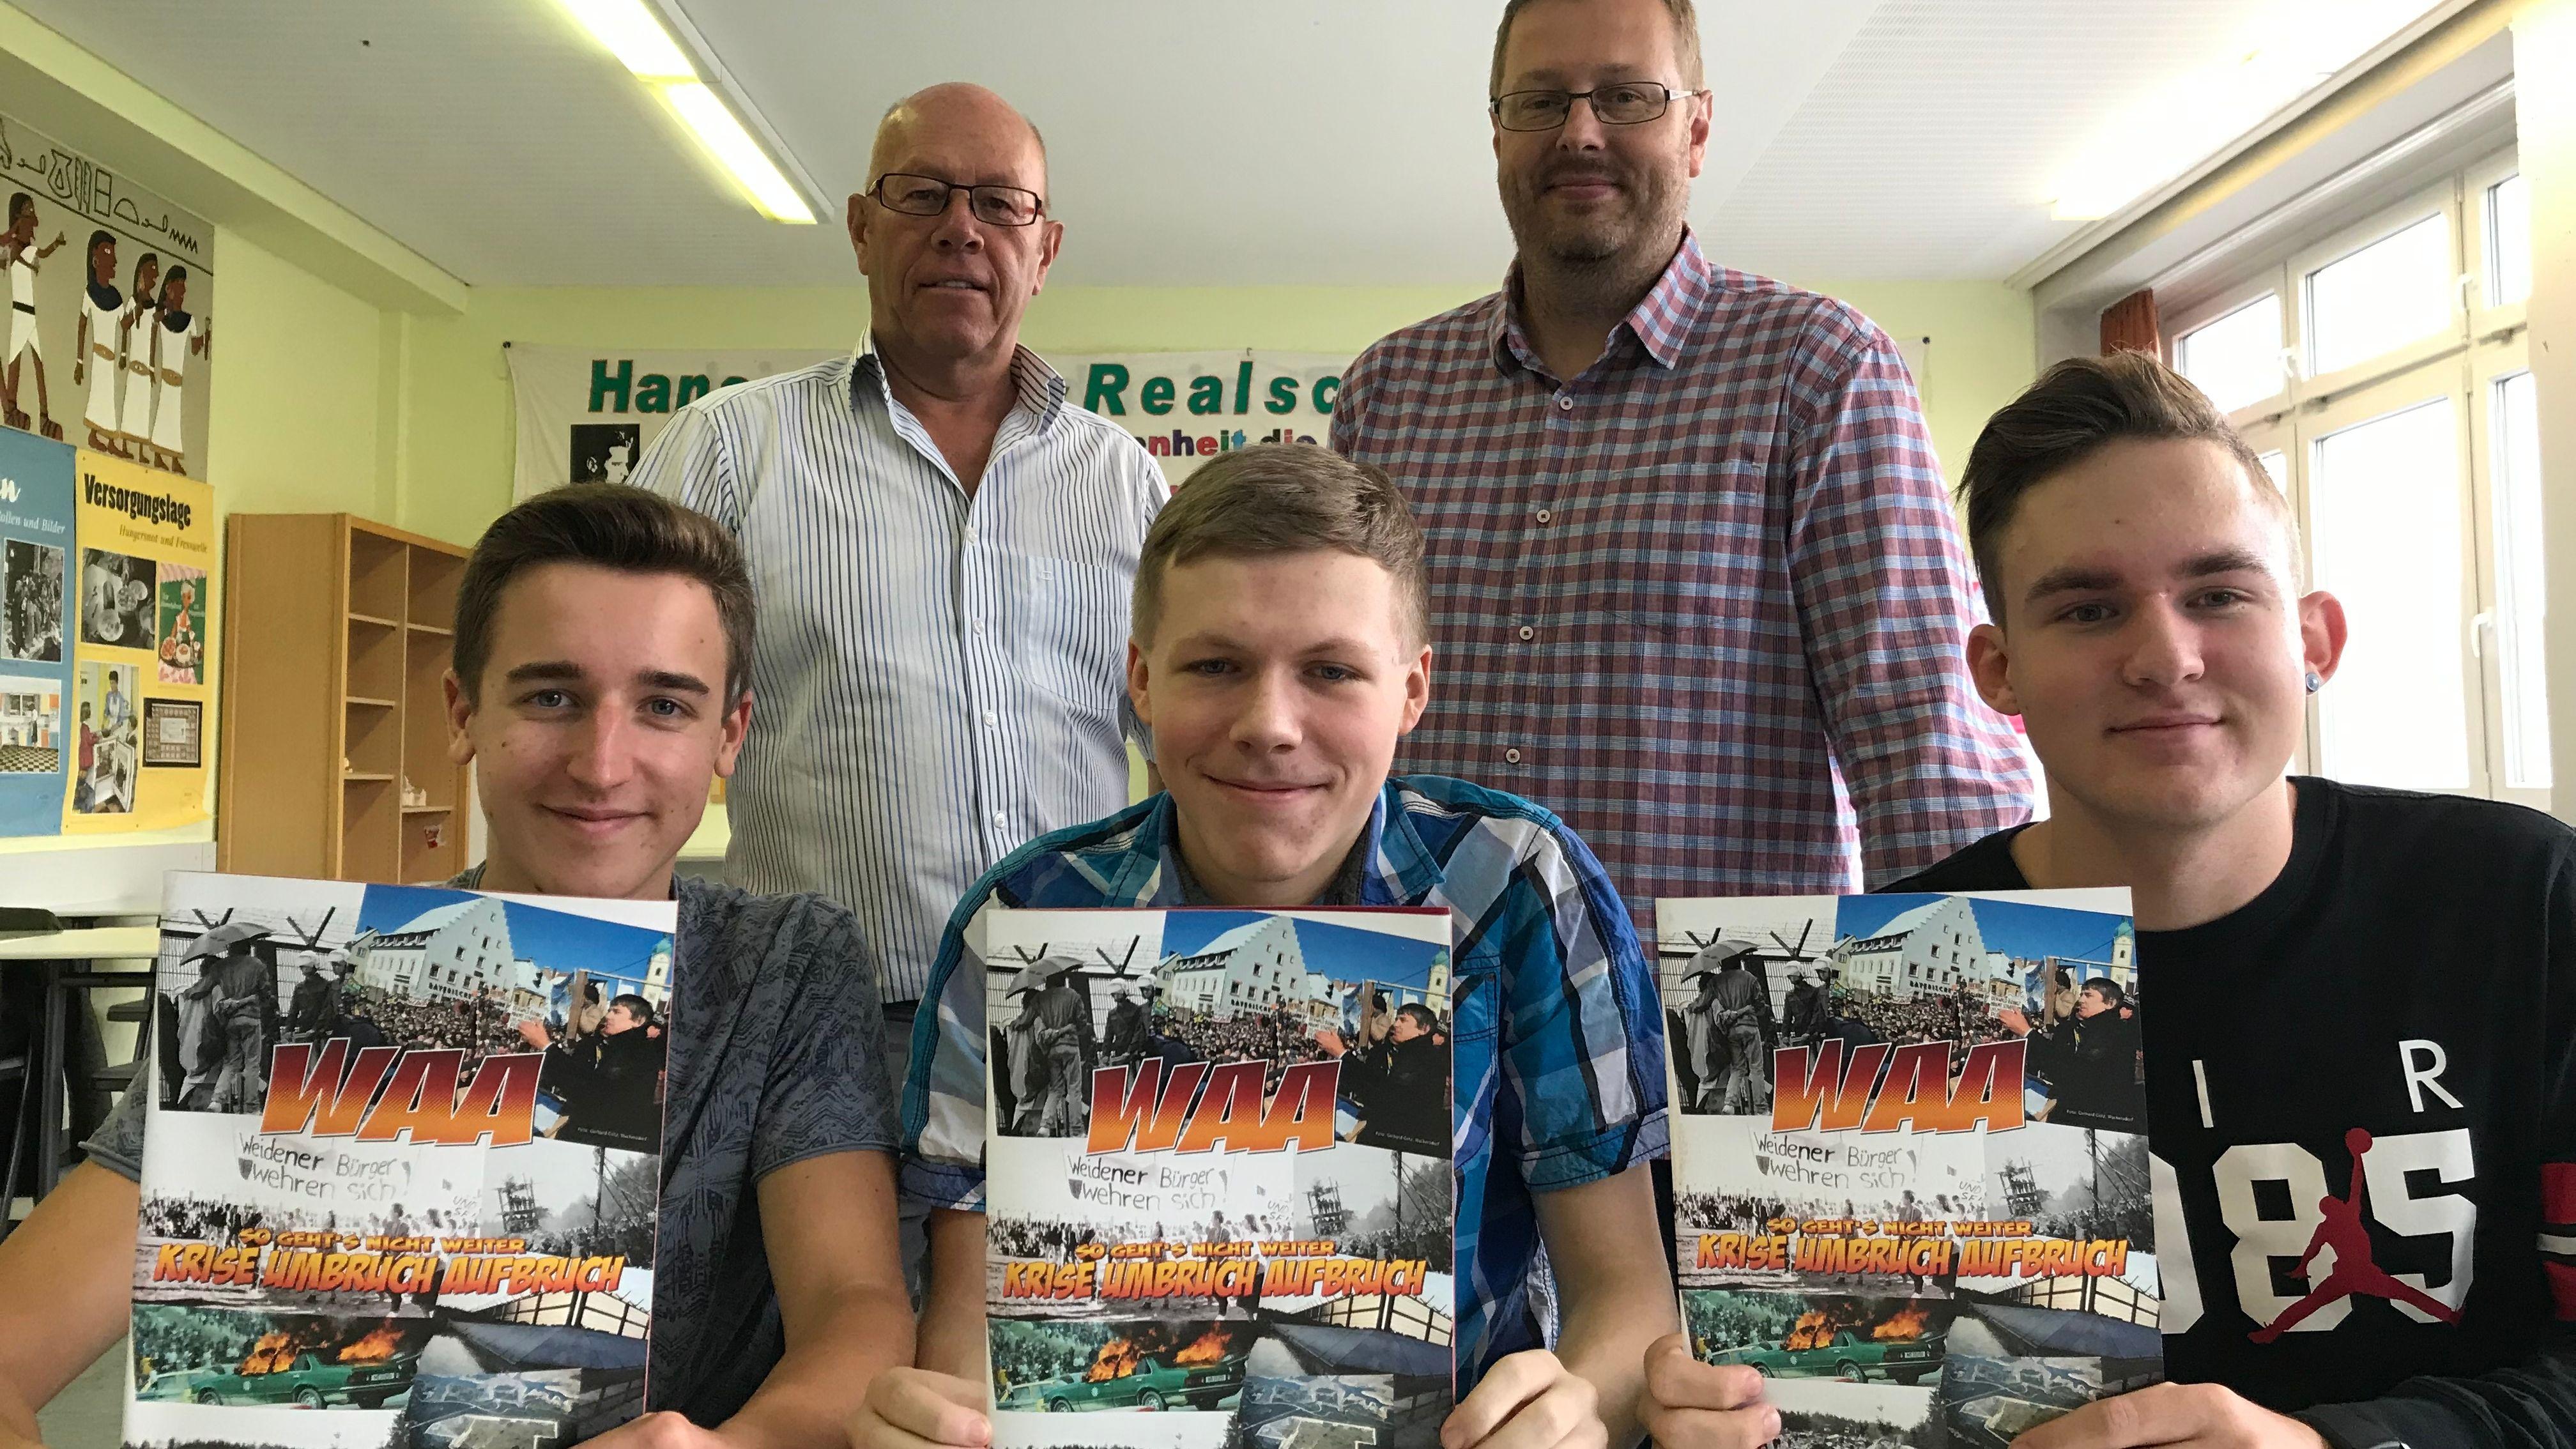 Schüler der Hans-Scholl-Realschule Weiden mit WAA-Comic, dahinter Journalist Gerhard Götz und Lehrer Johannes Paar